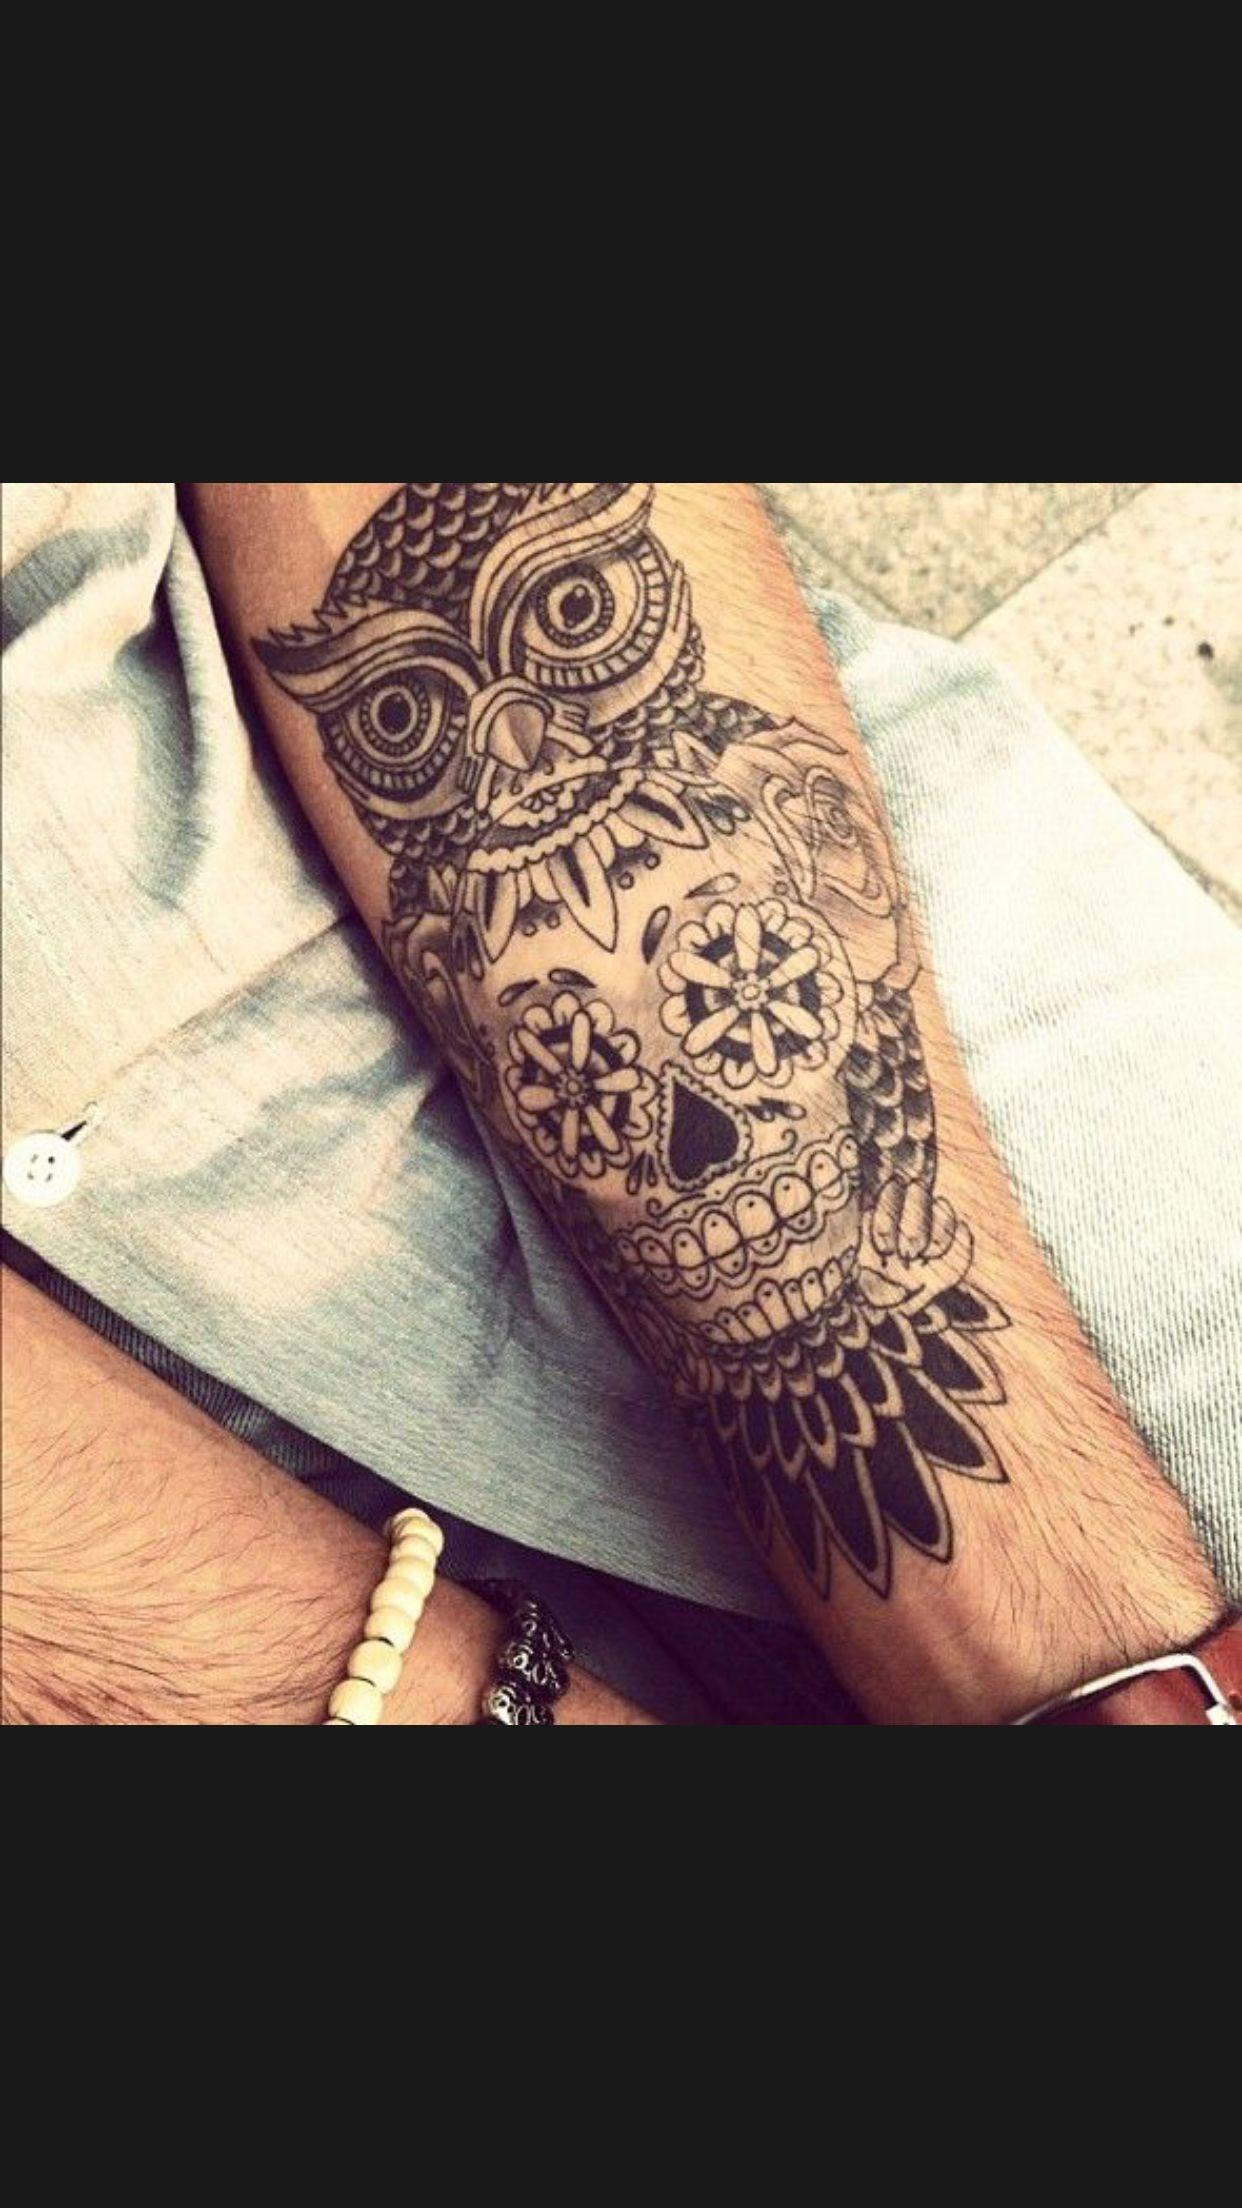 Bientot Tatoo Tatuaje Buho Tatuajes Et Buhos Tatoo